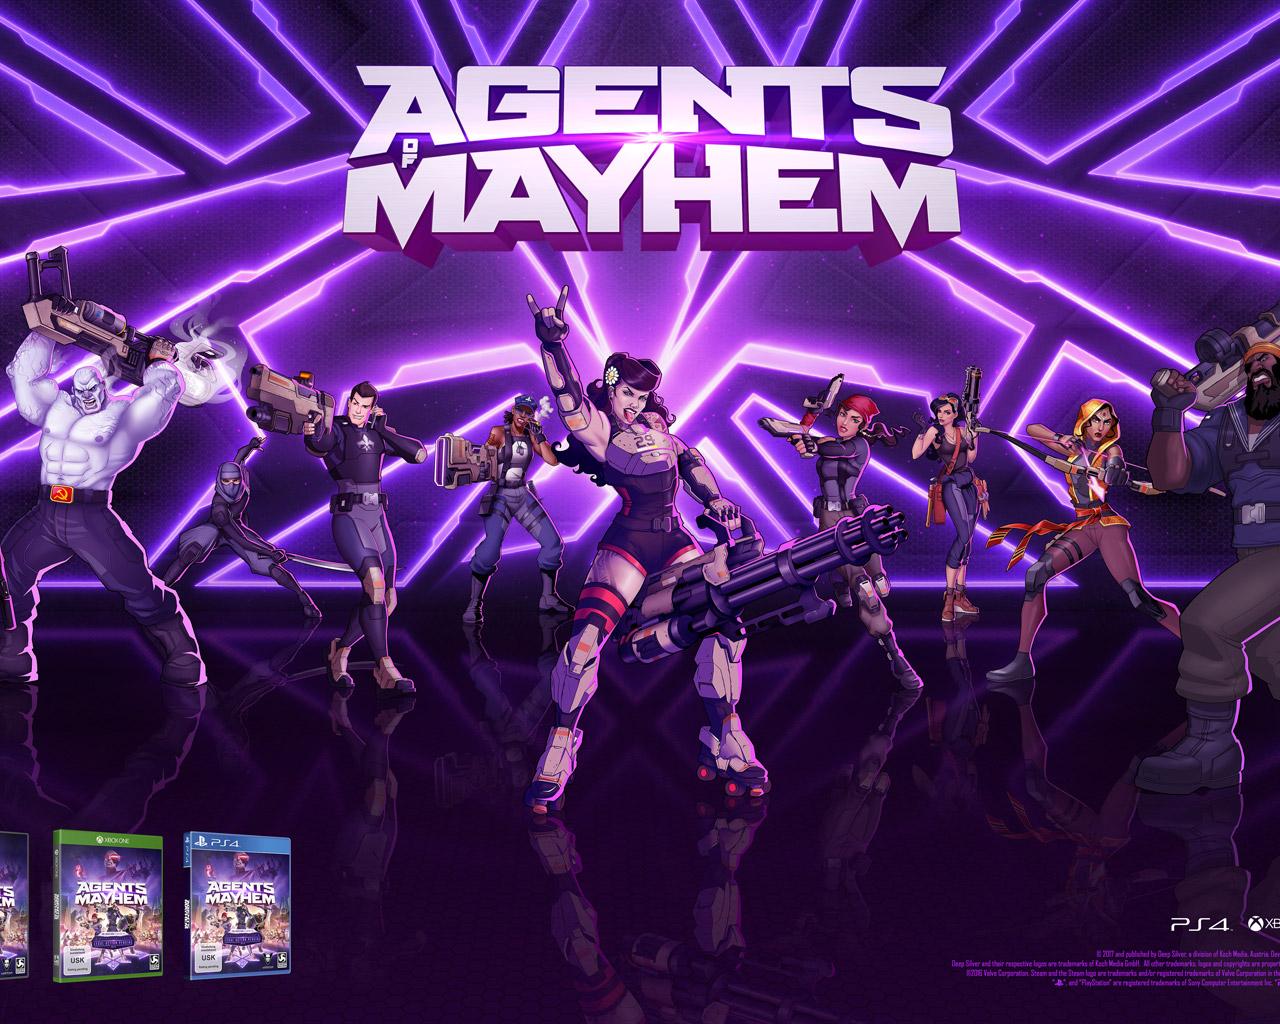 Free Agents of Mayhem Wallpaper in 1280x1024